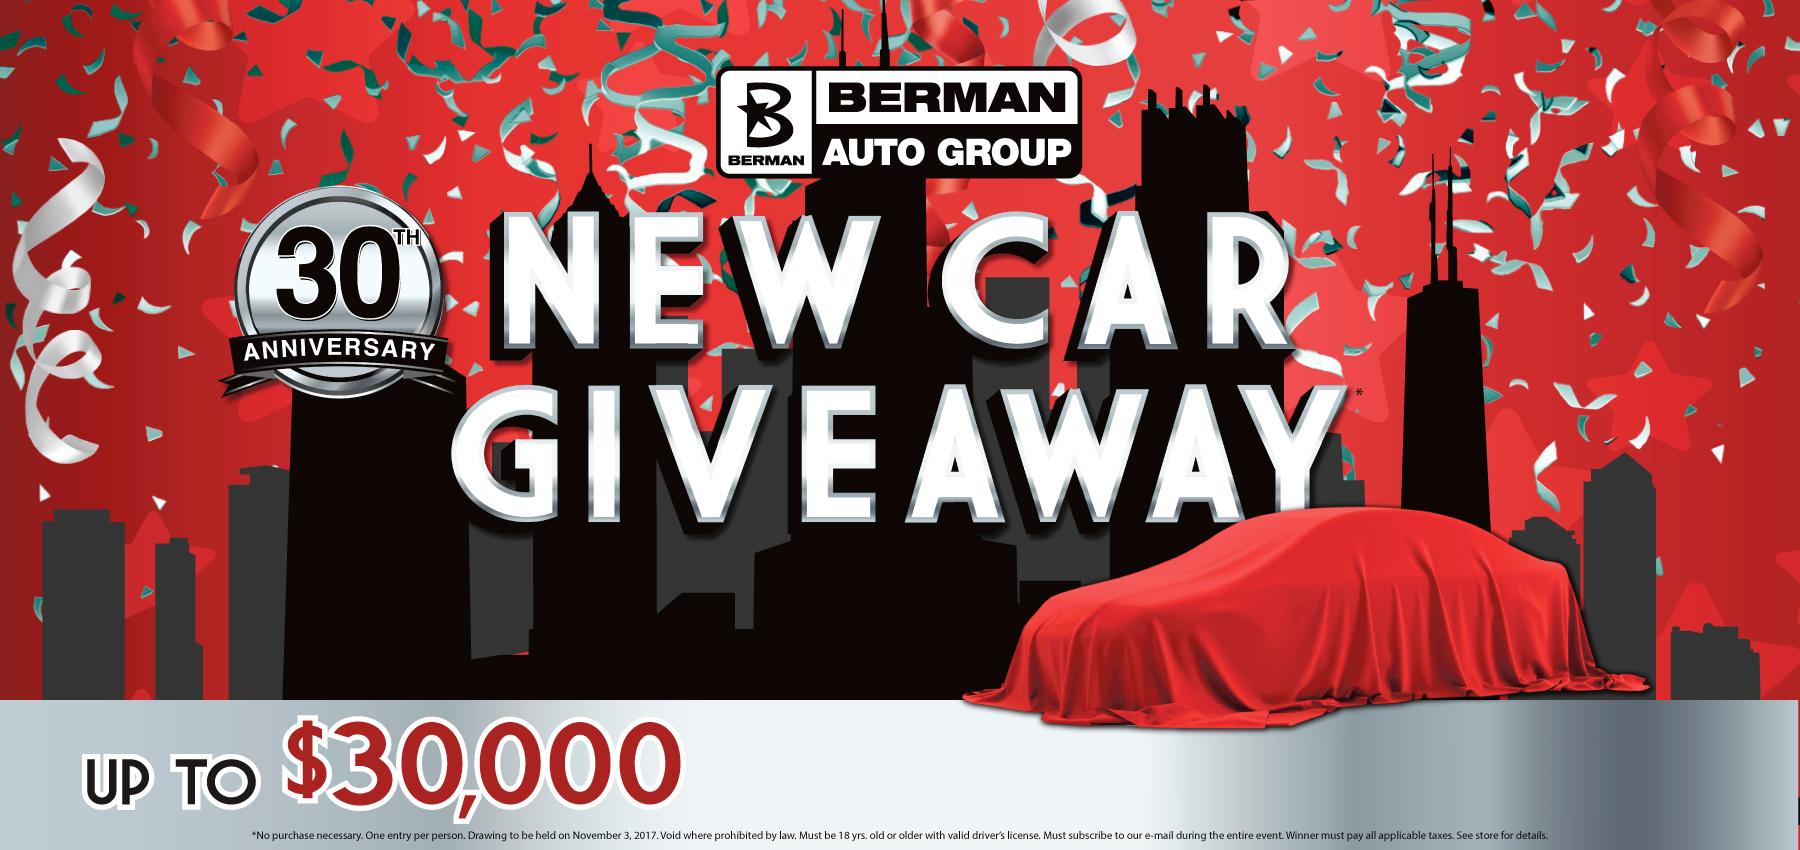 New Car Giveaway at Star Nissan!